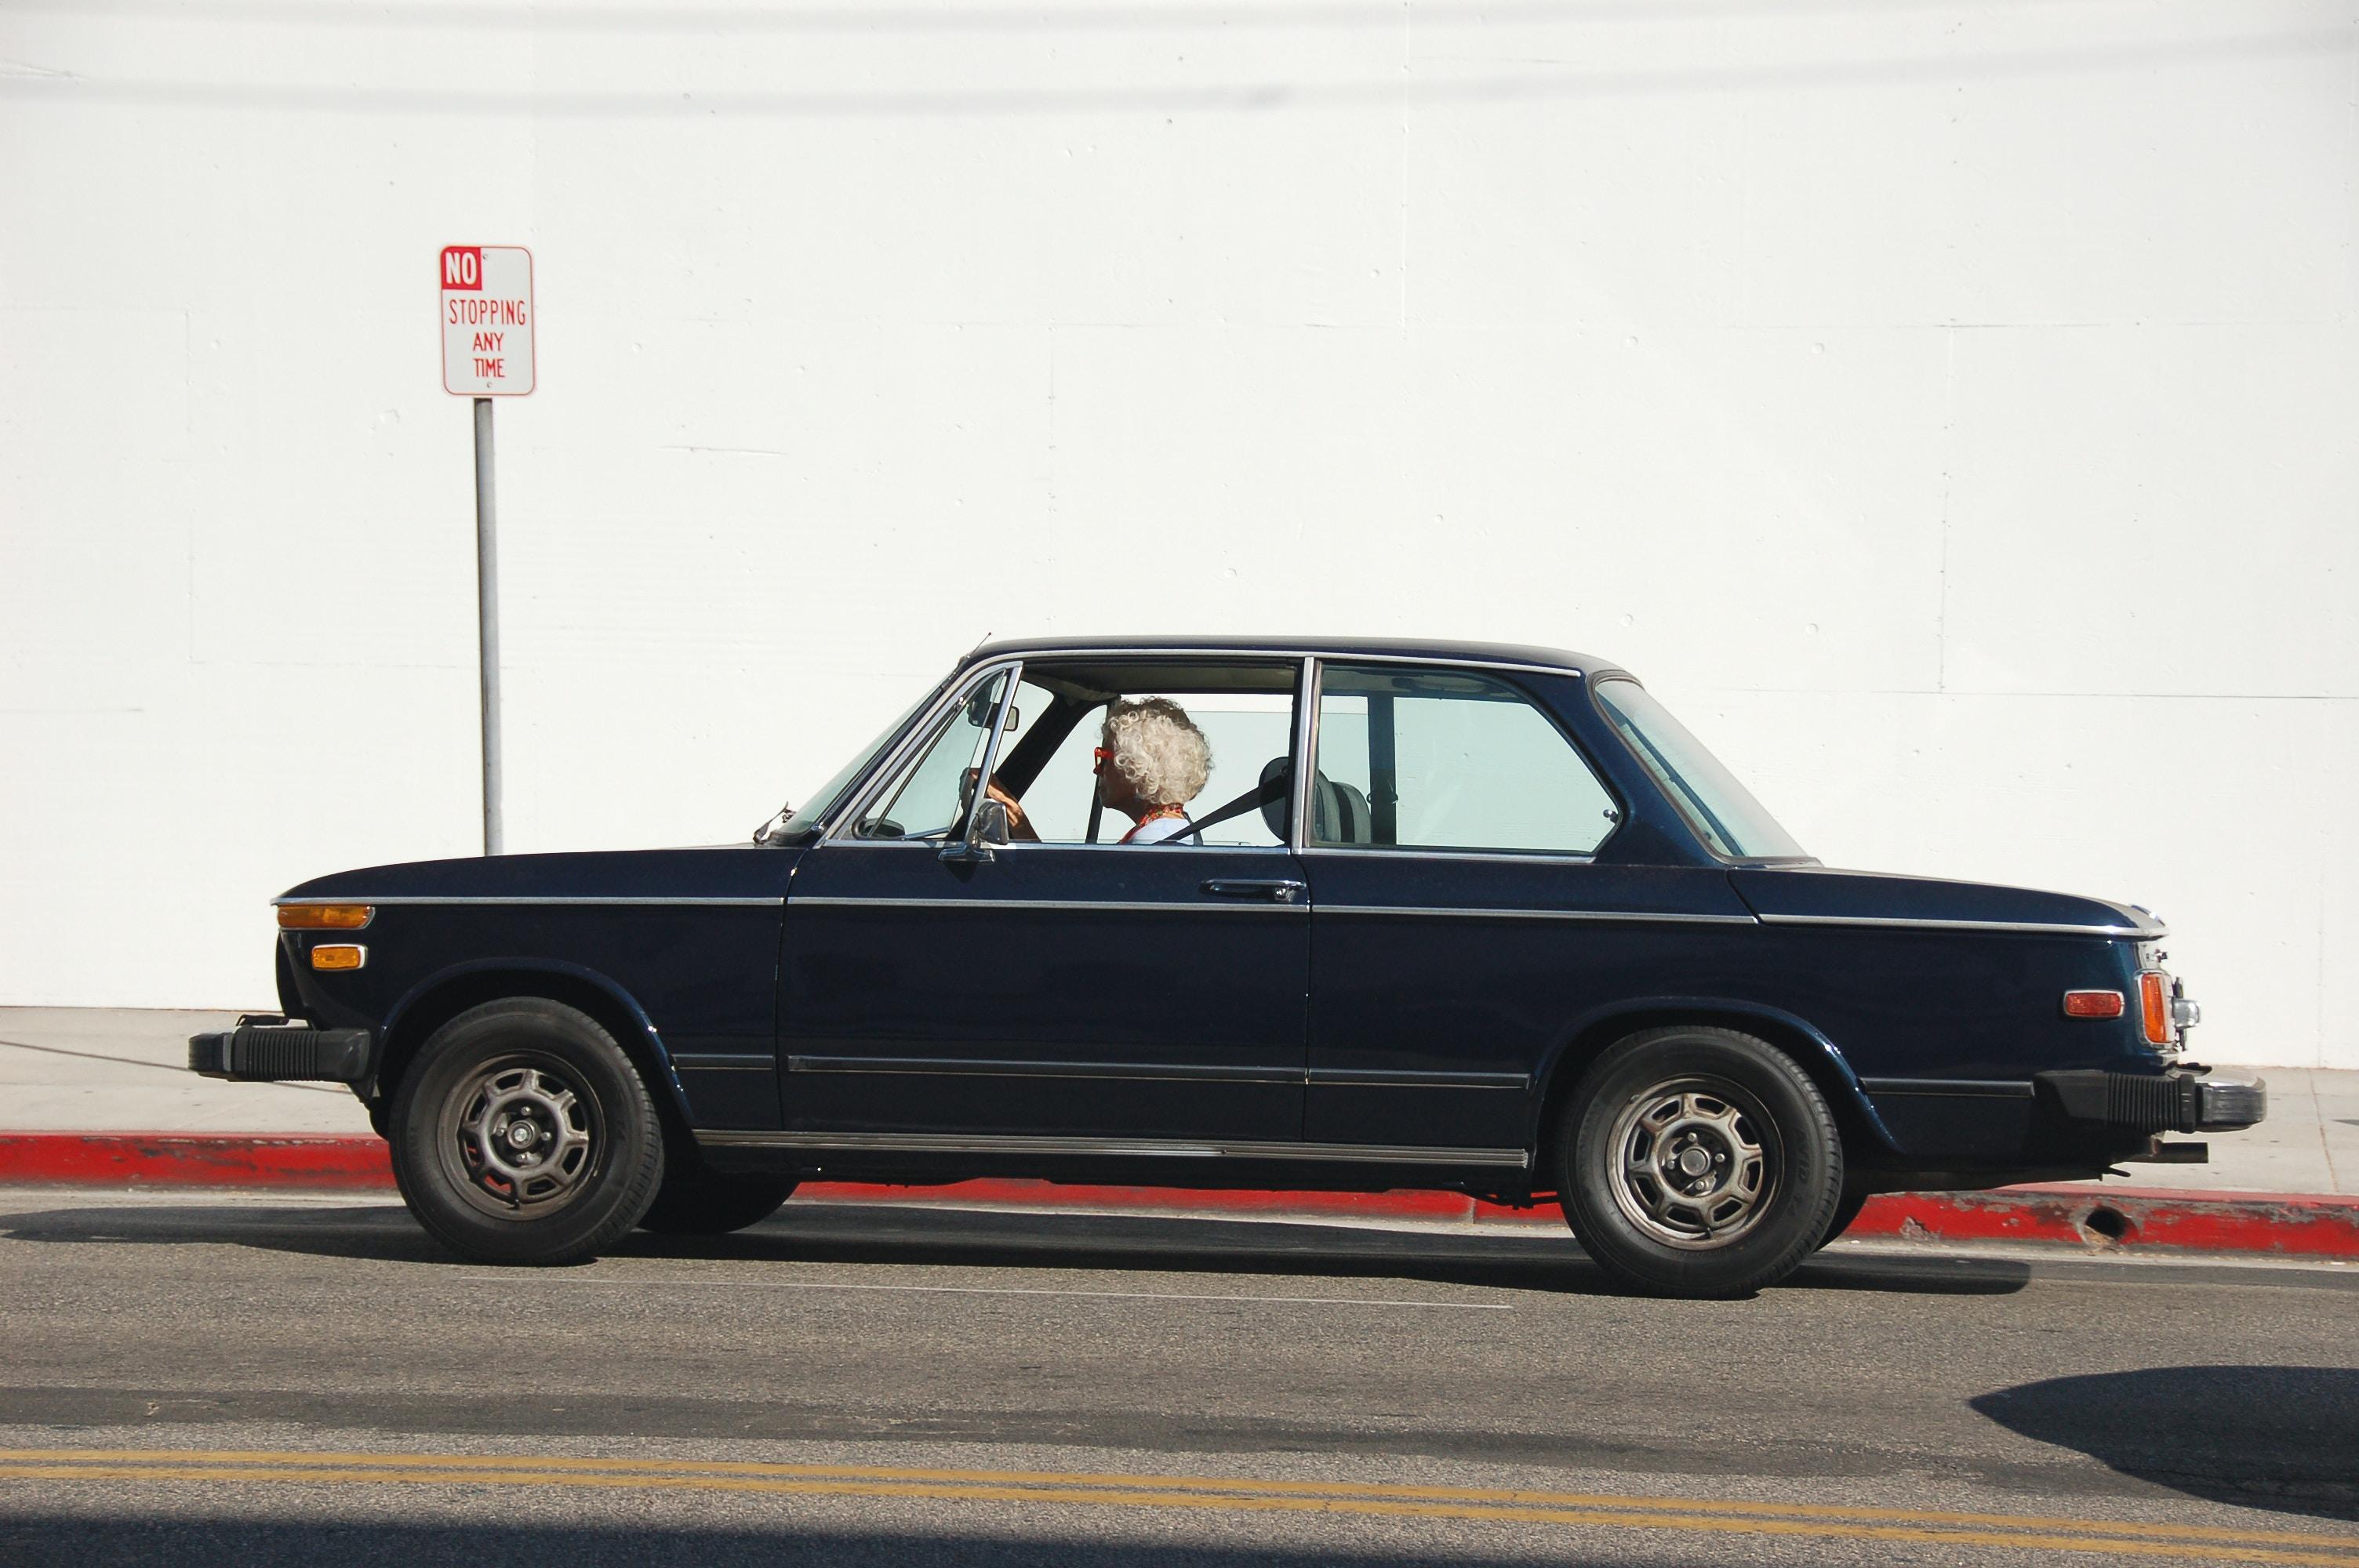 Old woman driving through an empty urban street in a dark blue car, Beverly Hills